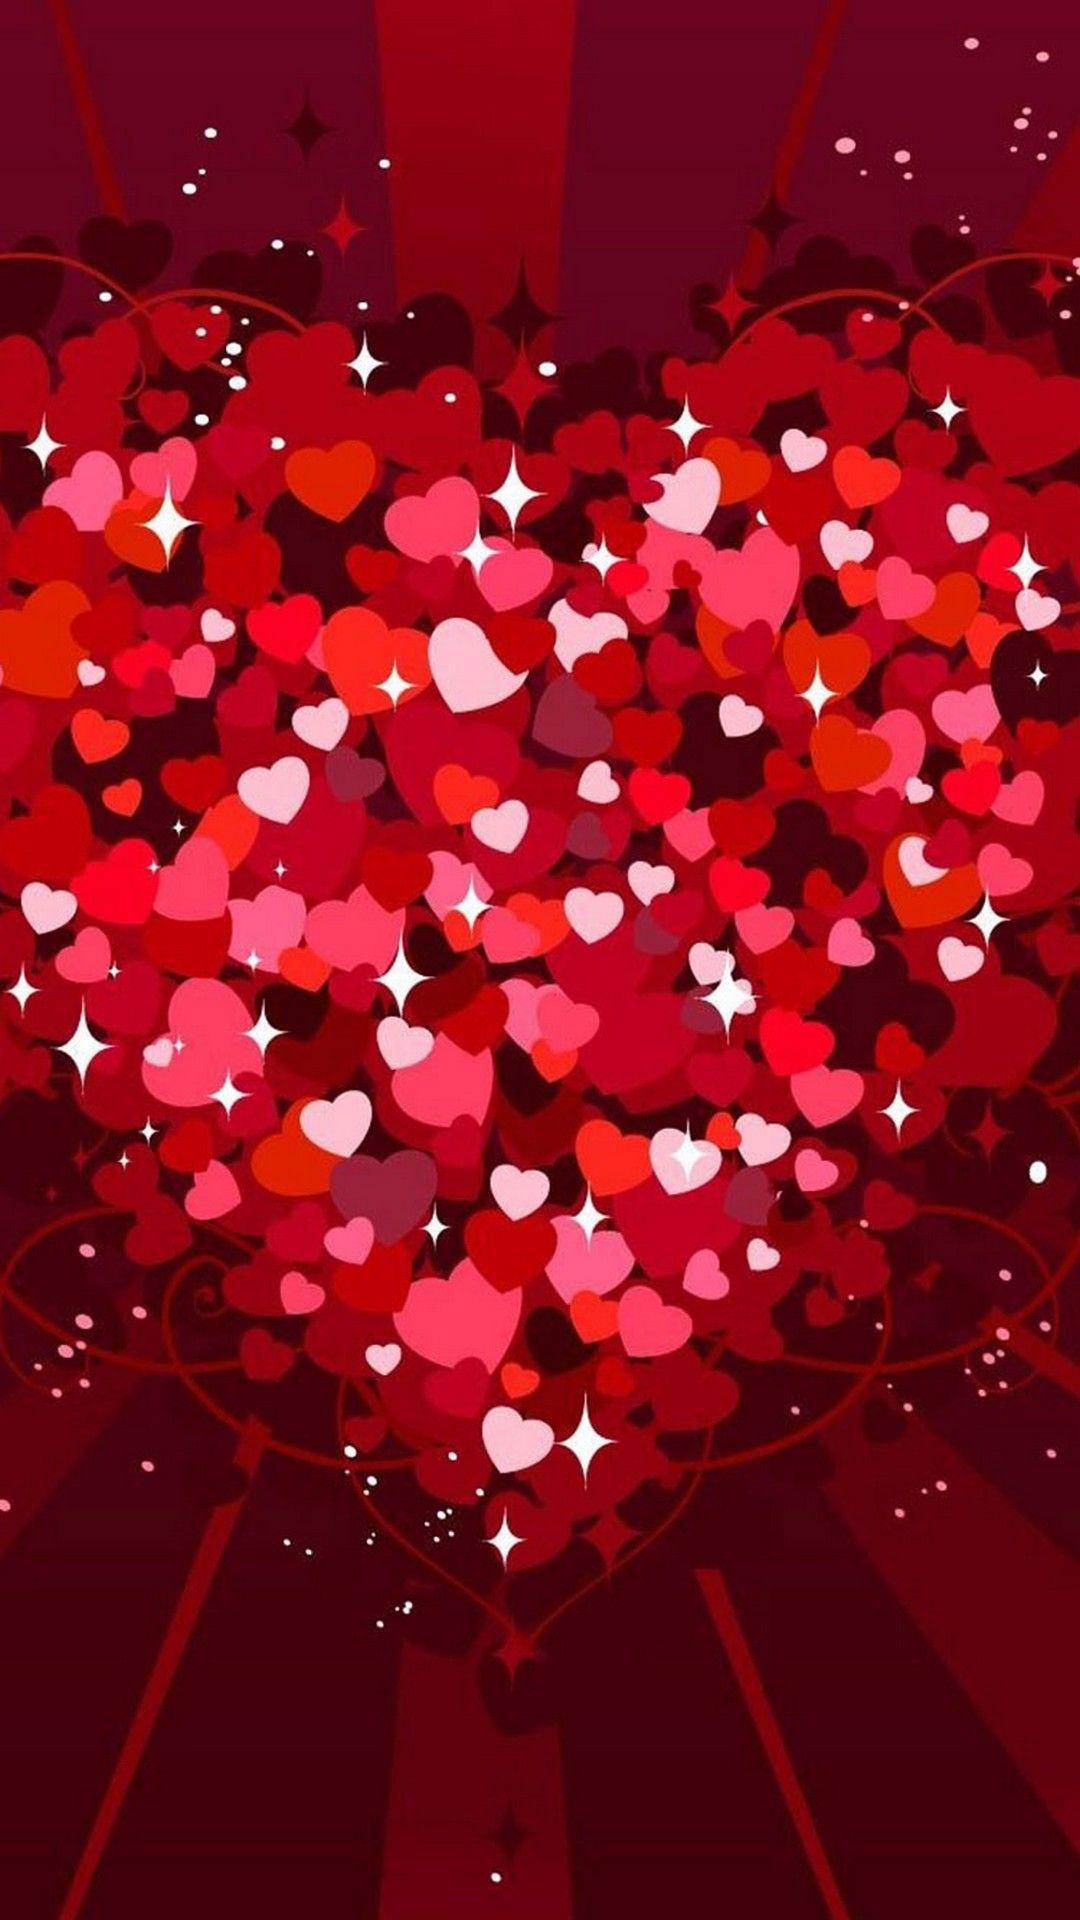 Heart Valentine Day Wallpaper Iphone Valentines Wallpaper Iphone Wallpaper Iphone Wallpaper 10